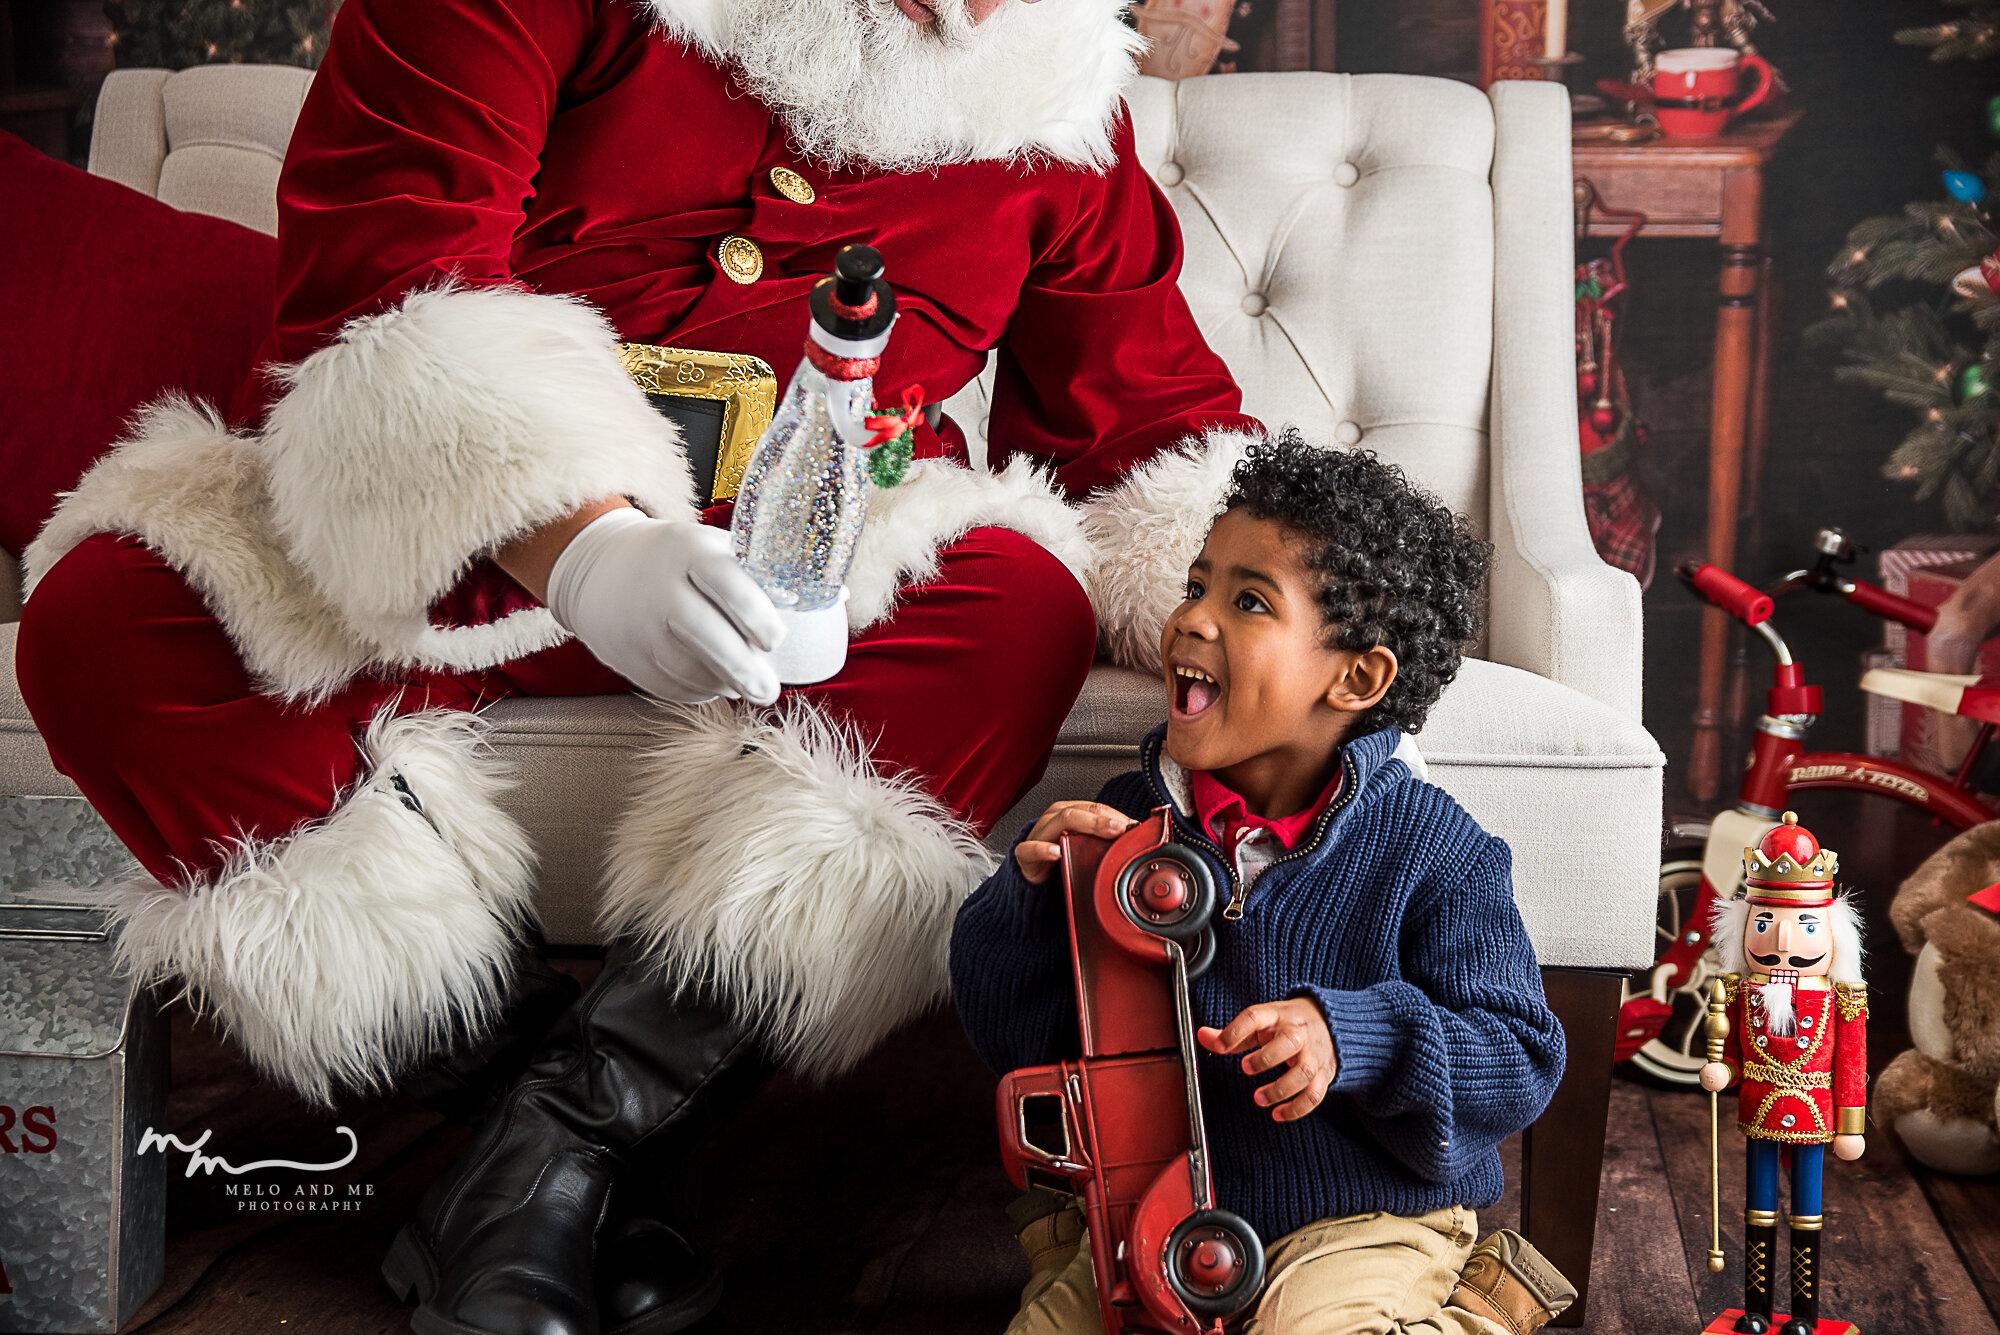 christmas photo sessions, santa experience, santa photo session, portraits, melo and me houston family child photographer, the heights santa